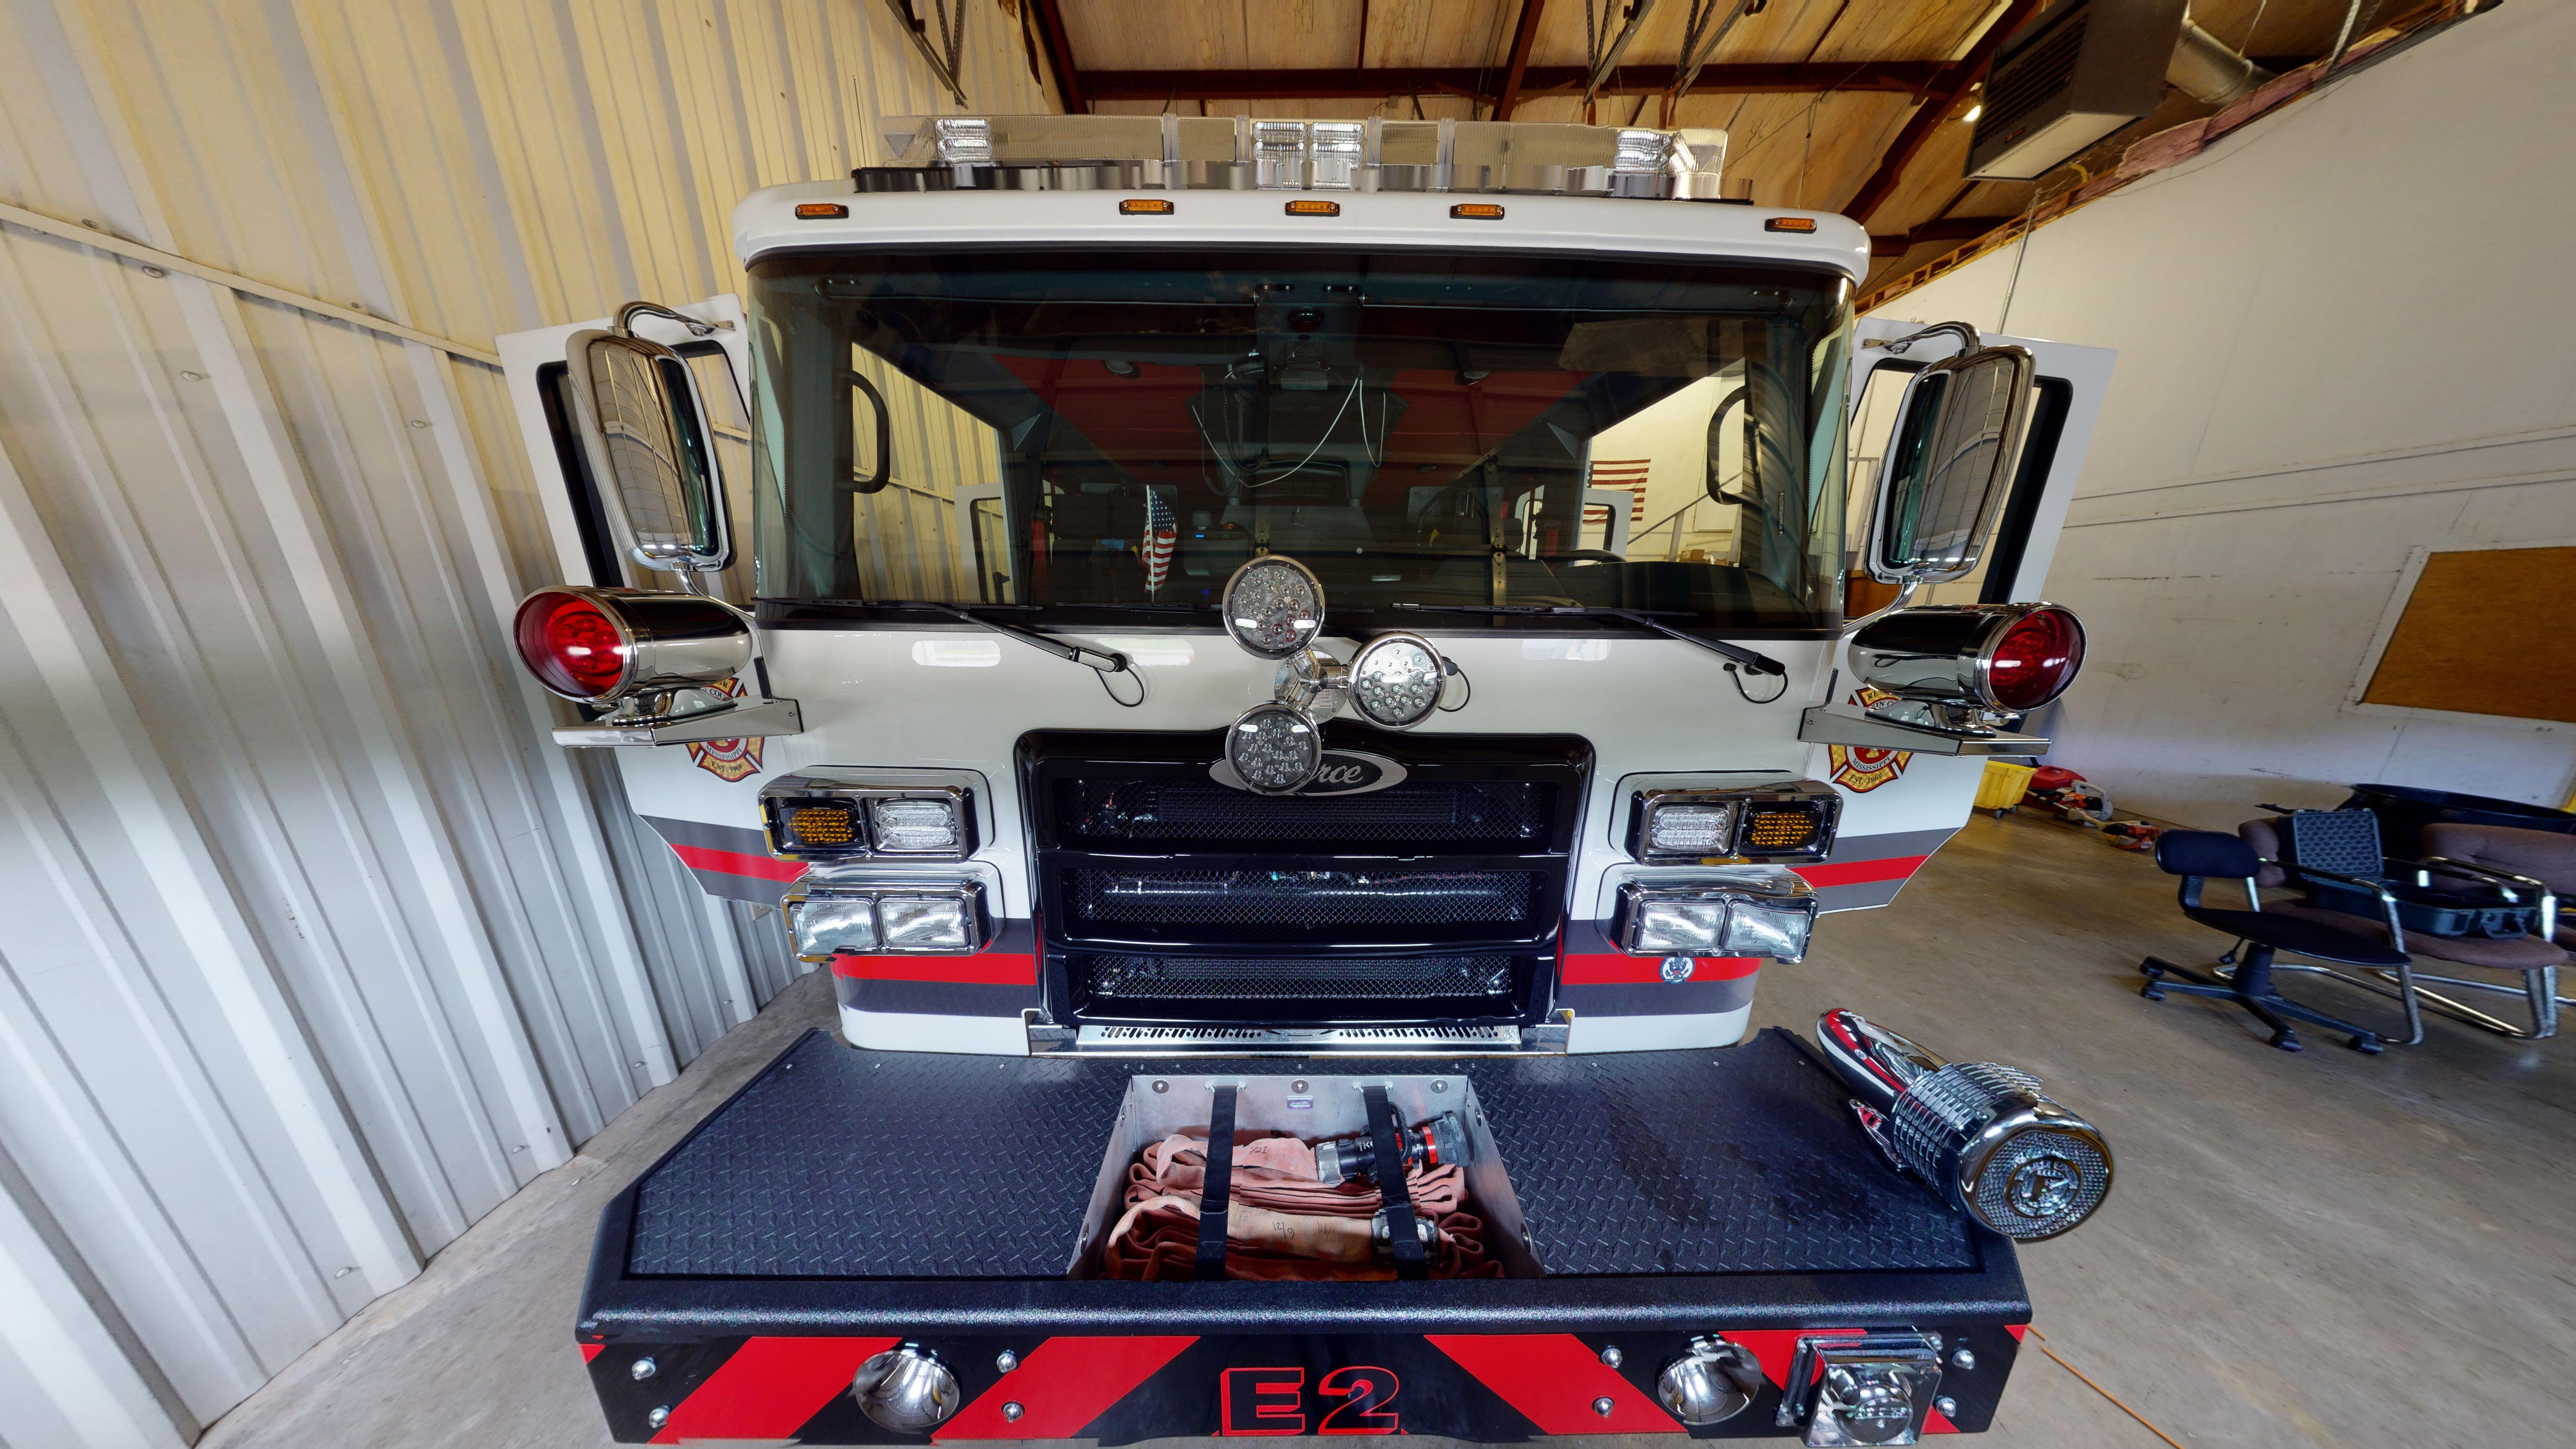 Reservoir-Fire-Dept-Engine-2-07192021_102032